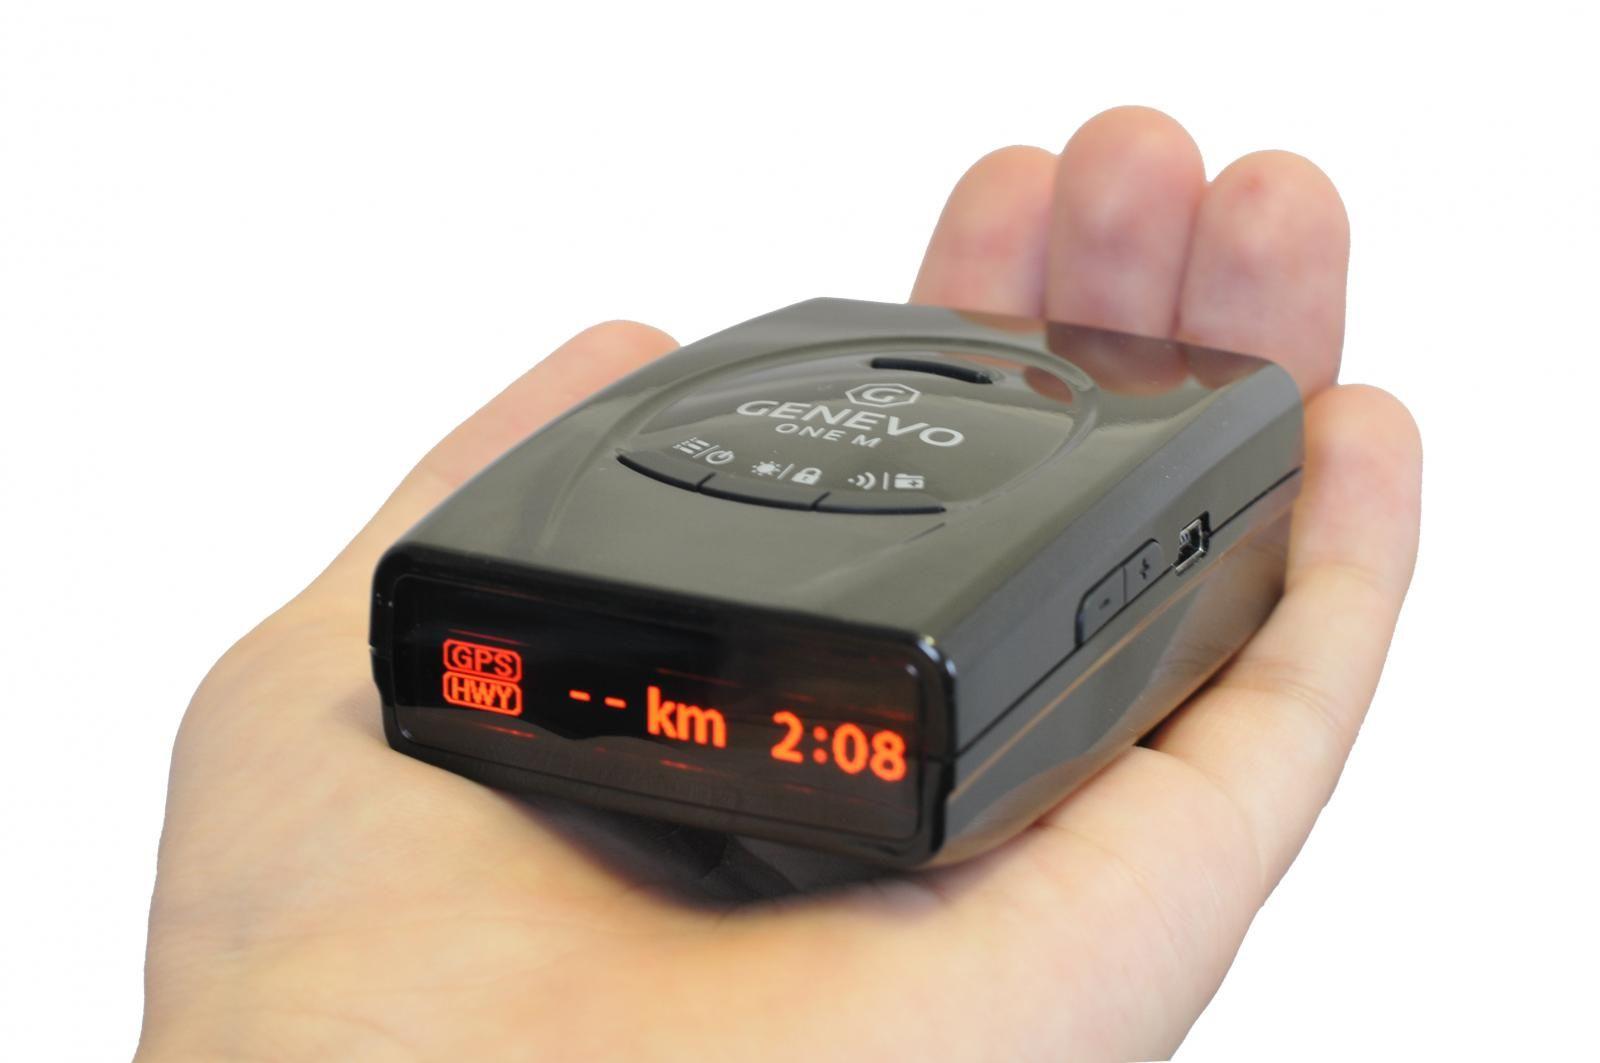 Detector radar portátil Genevo ONE M